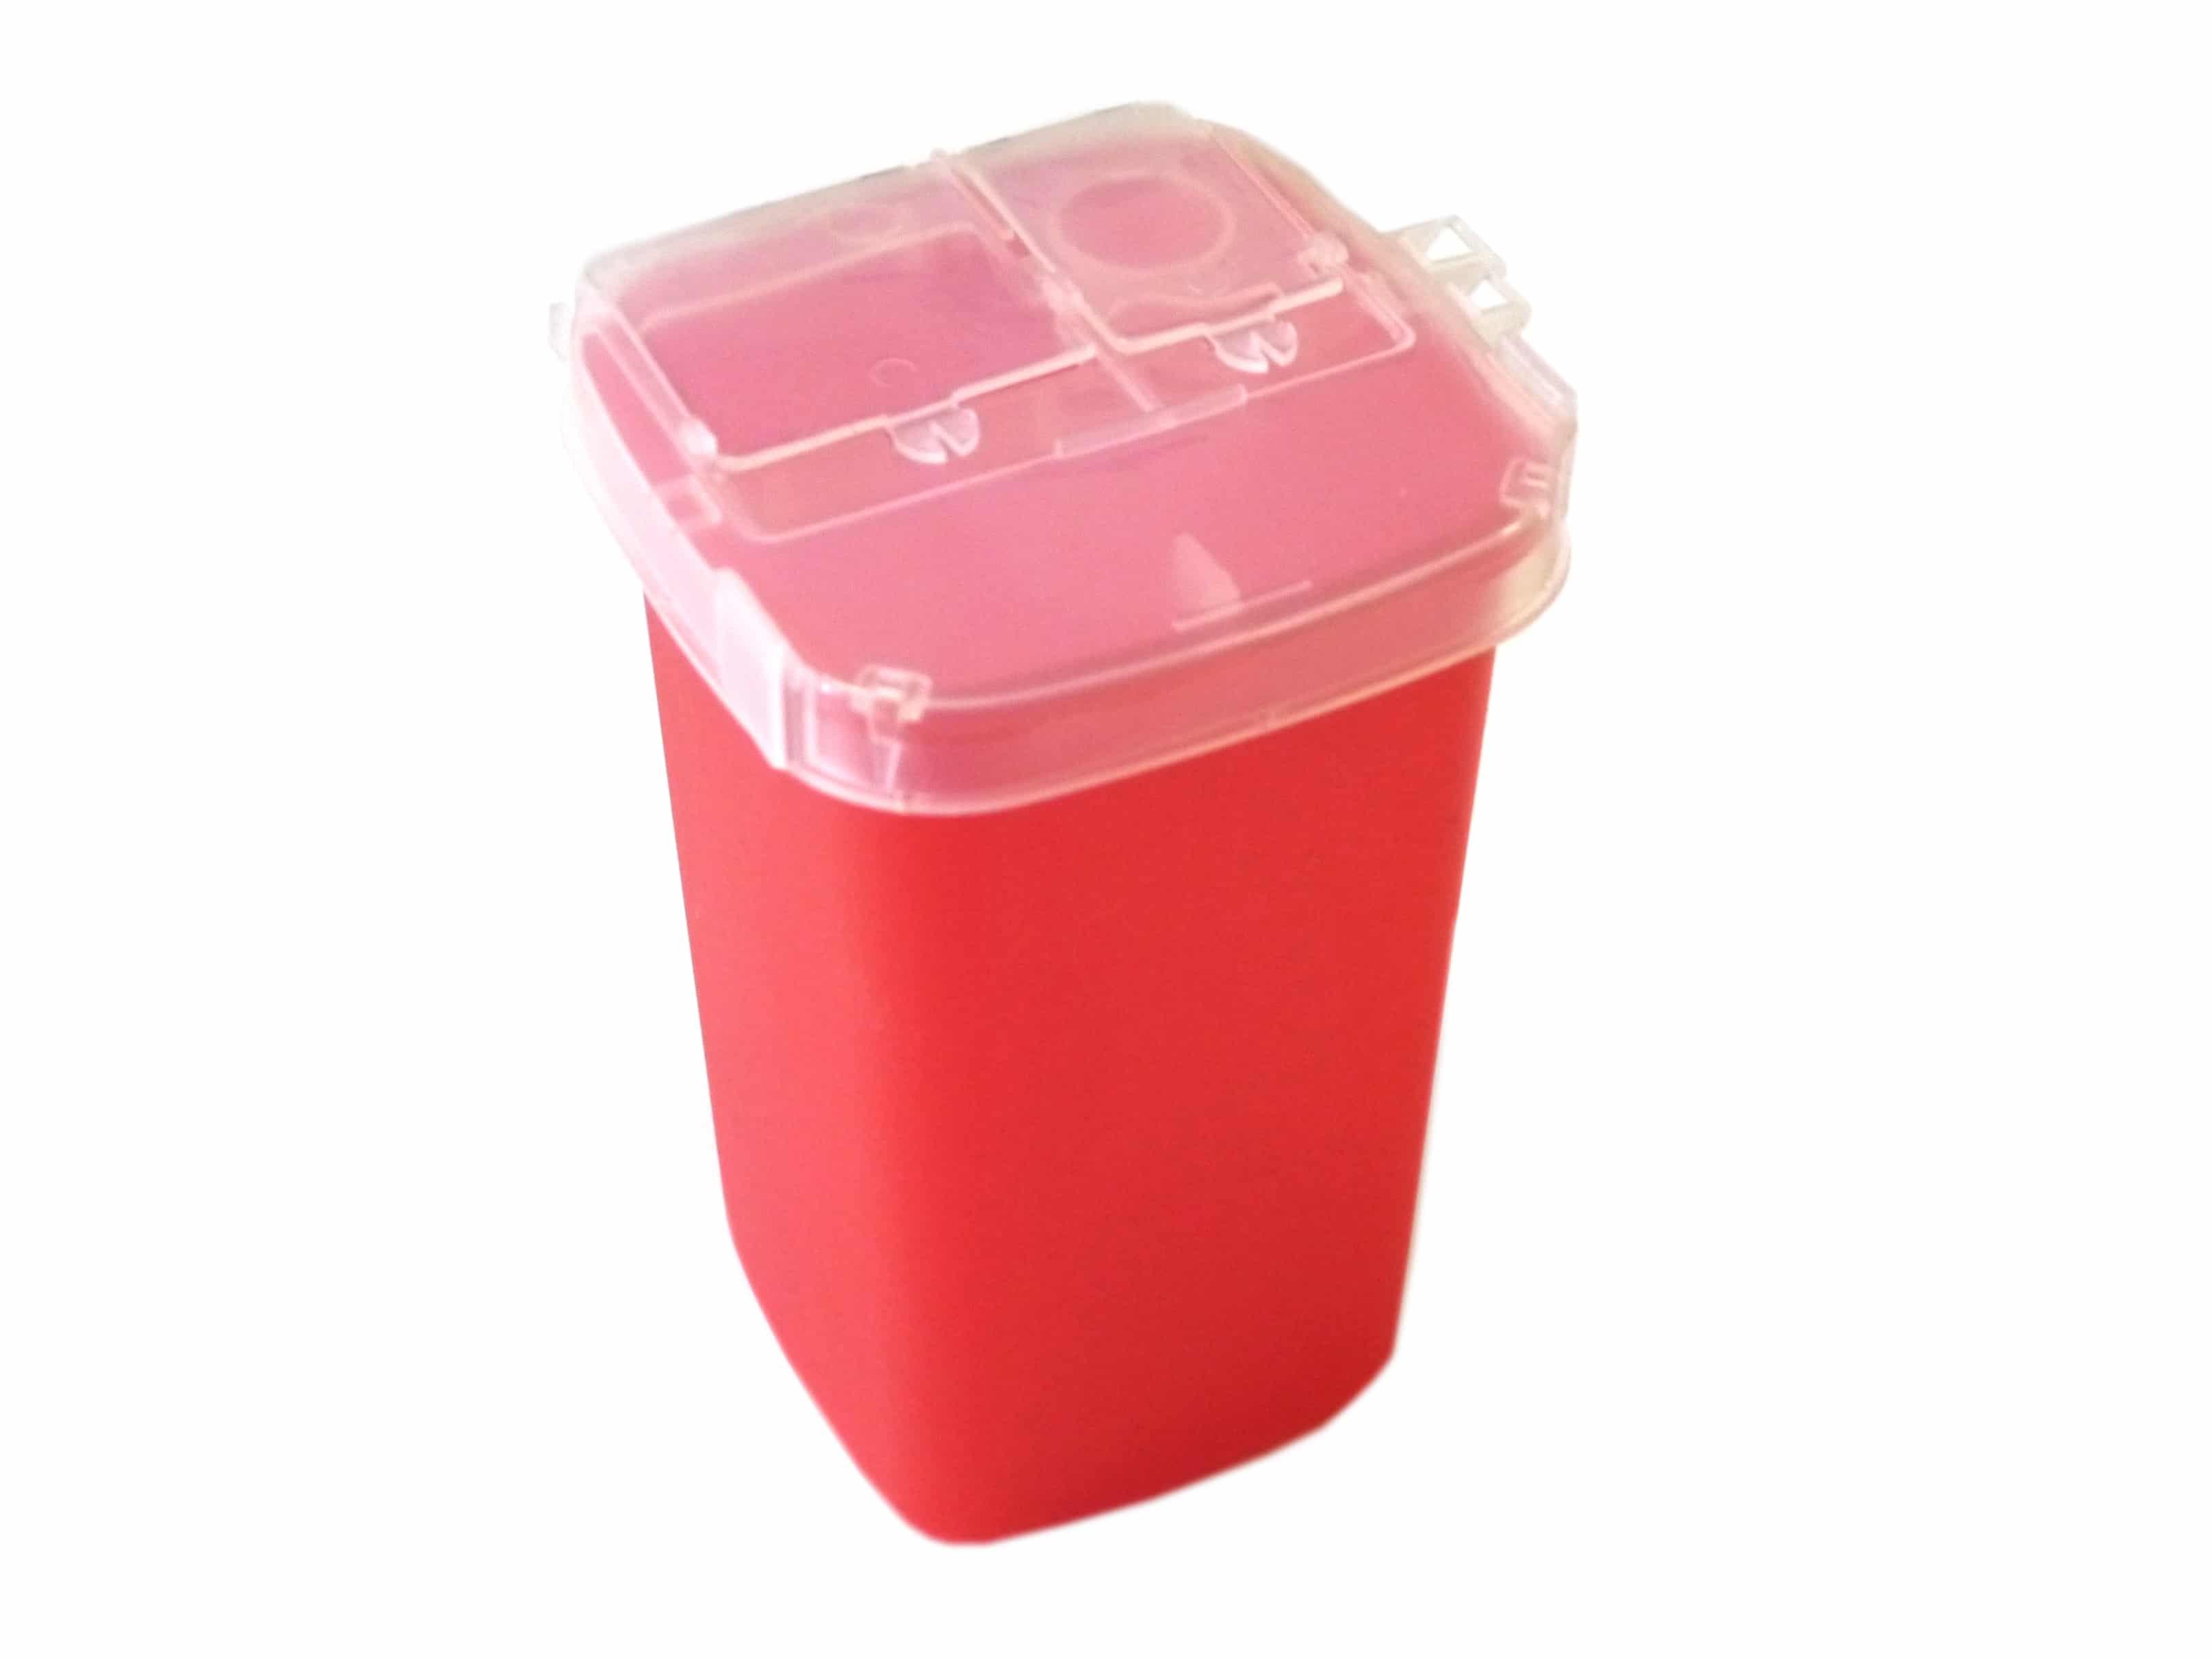 permanent makeup sharps container 1qt 2